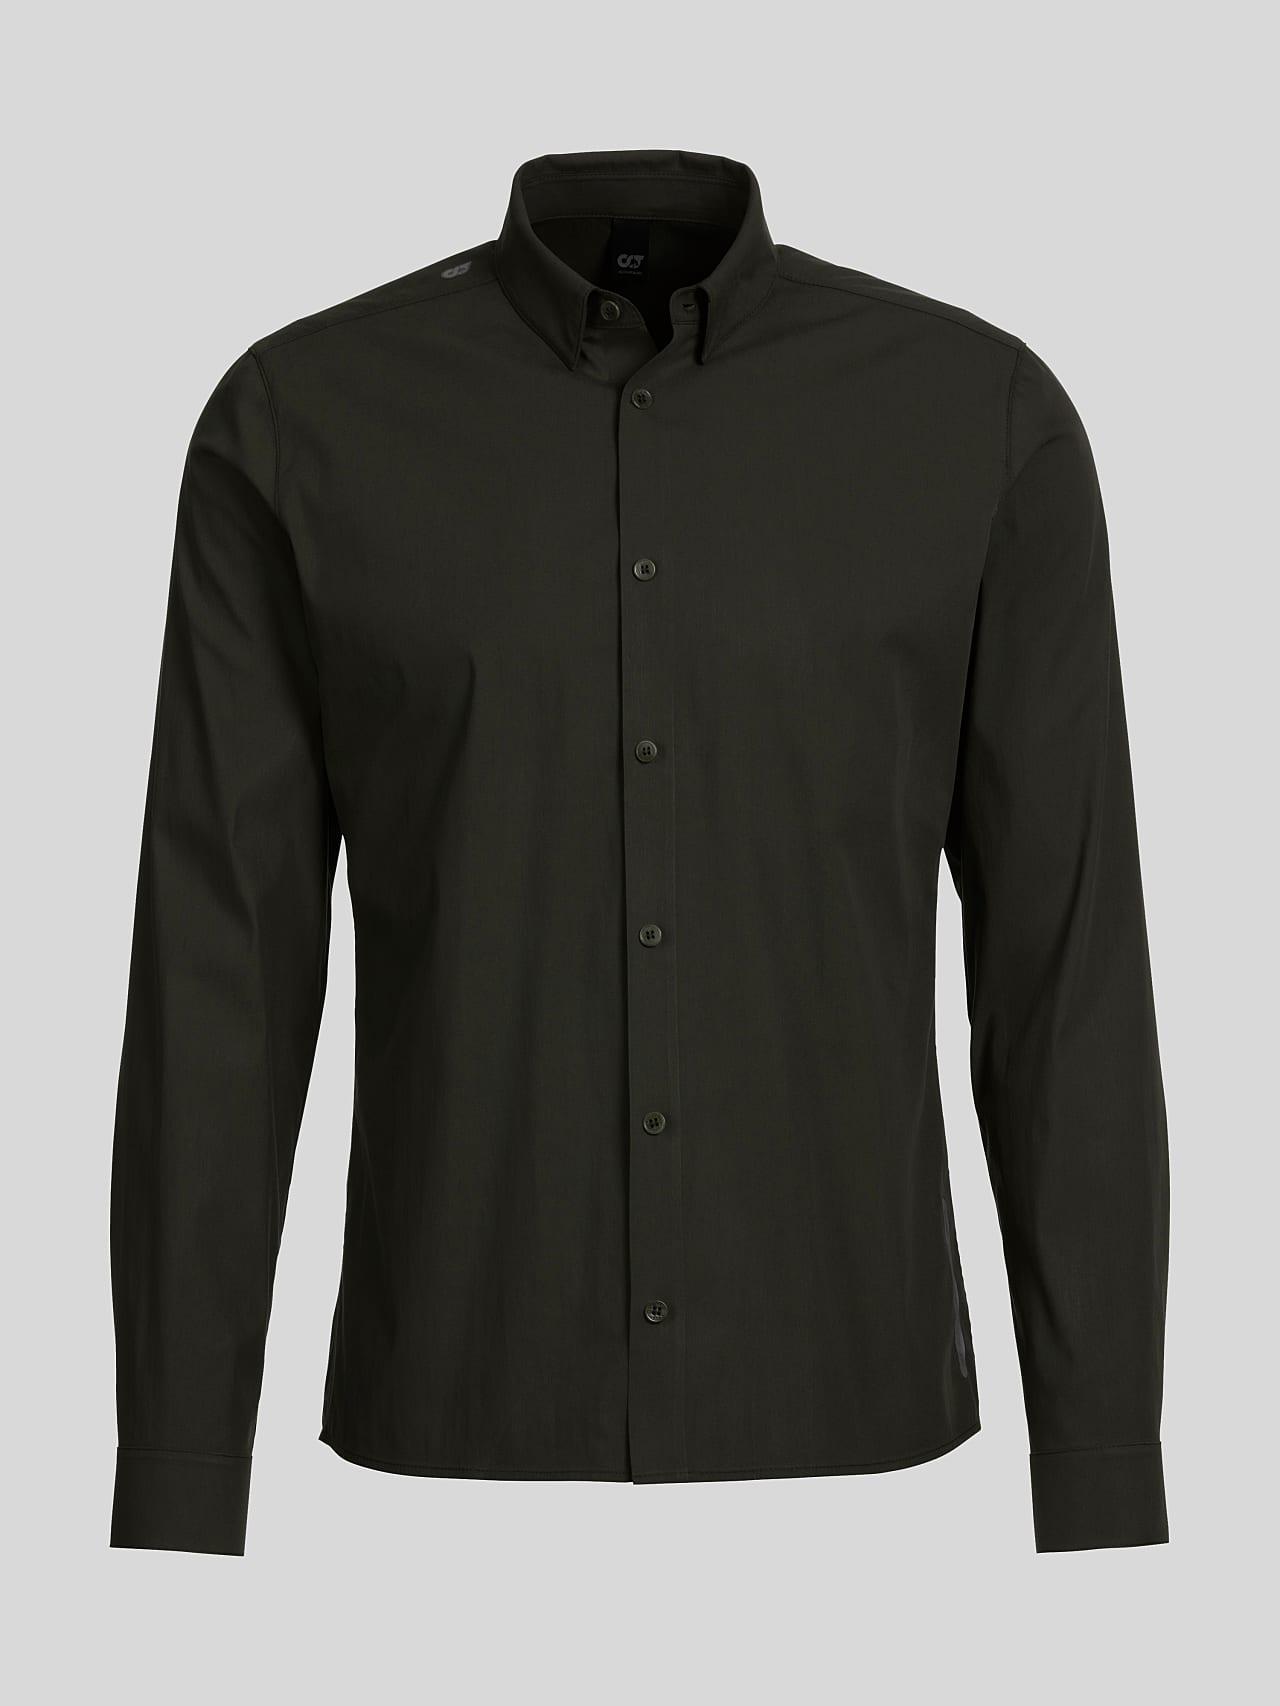 WAARG V1.Y5.01 Cotton-Stretch Shirt olive Back Alpha Tauri